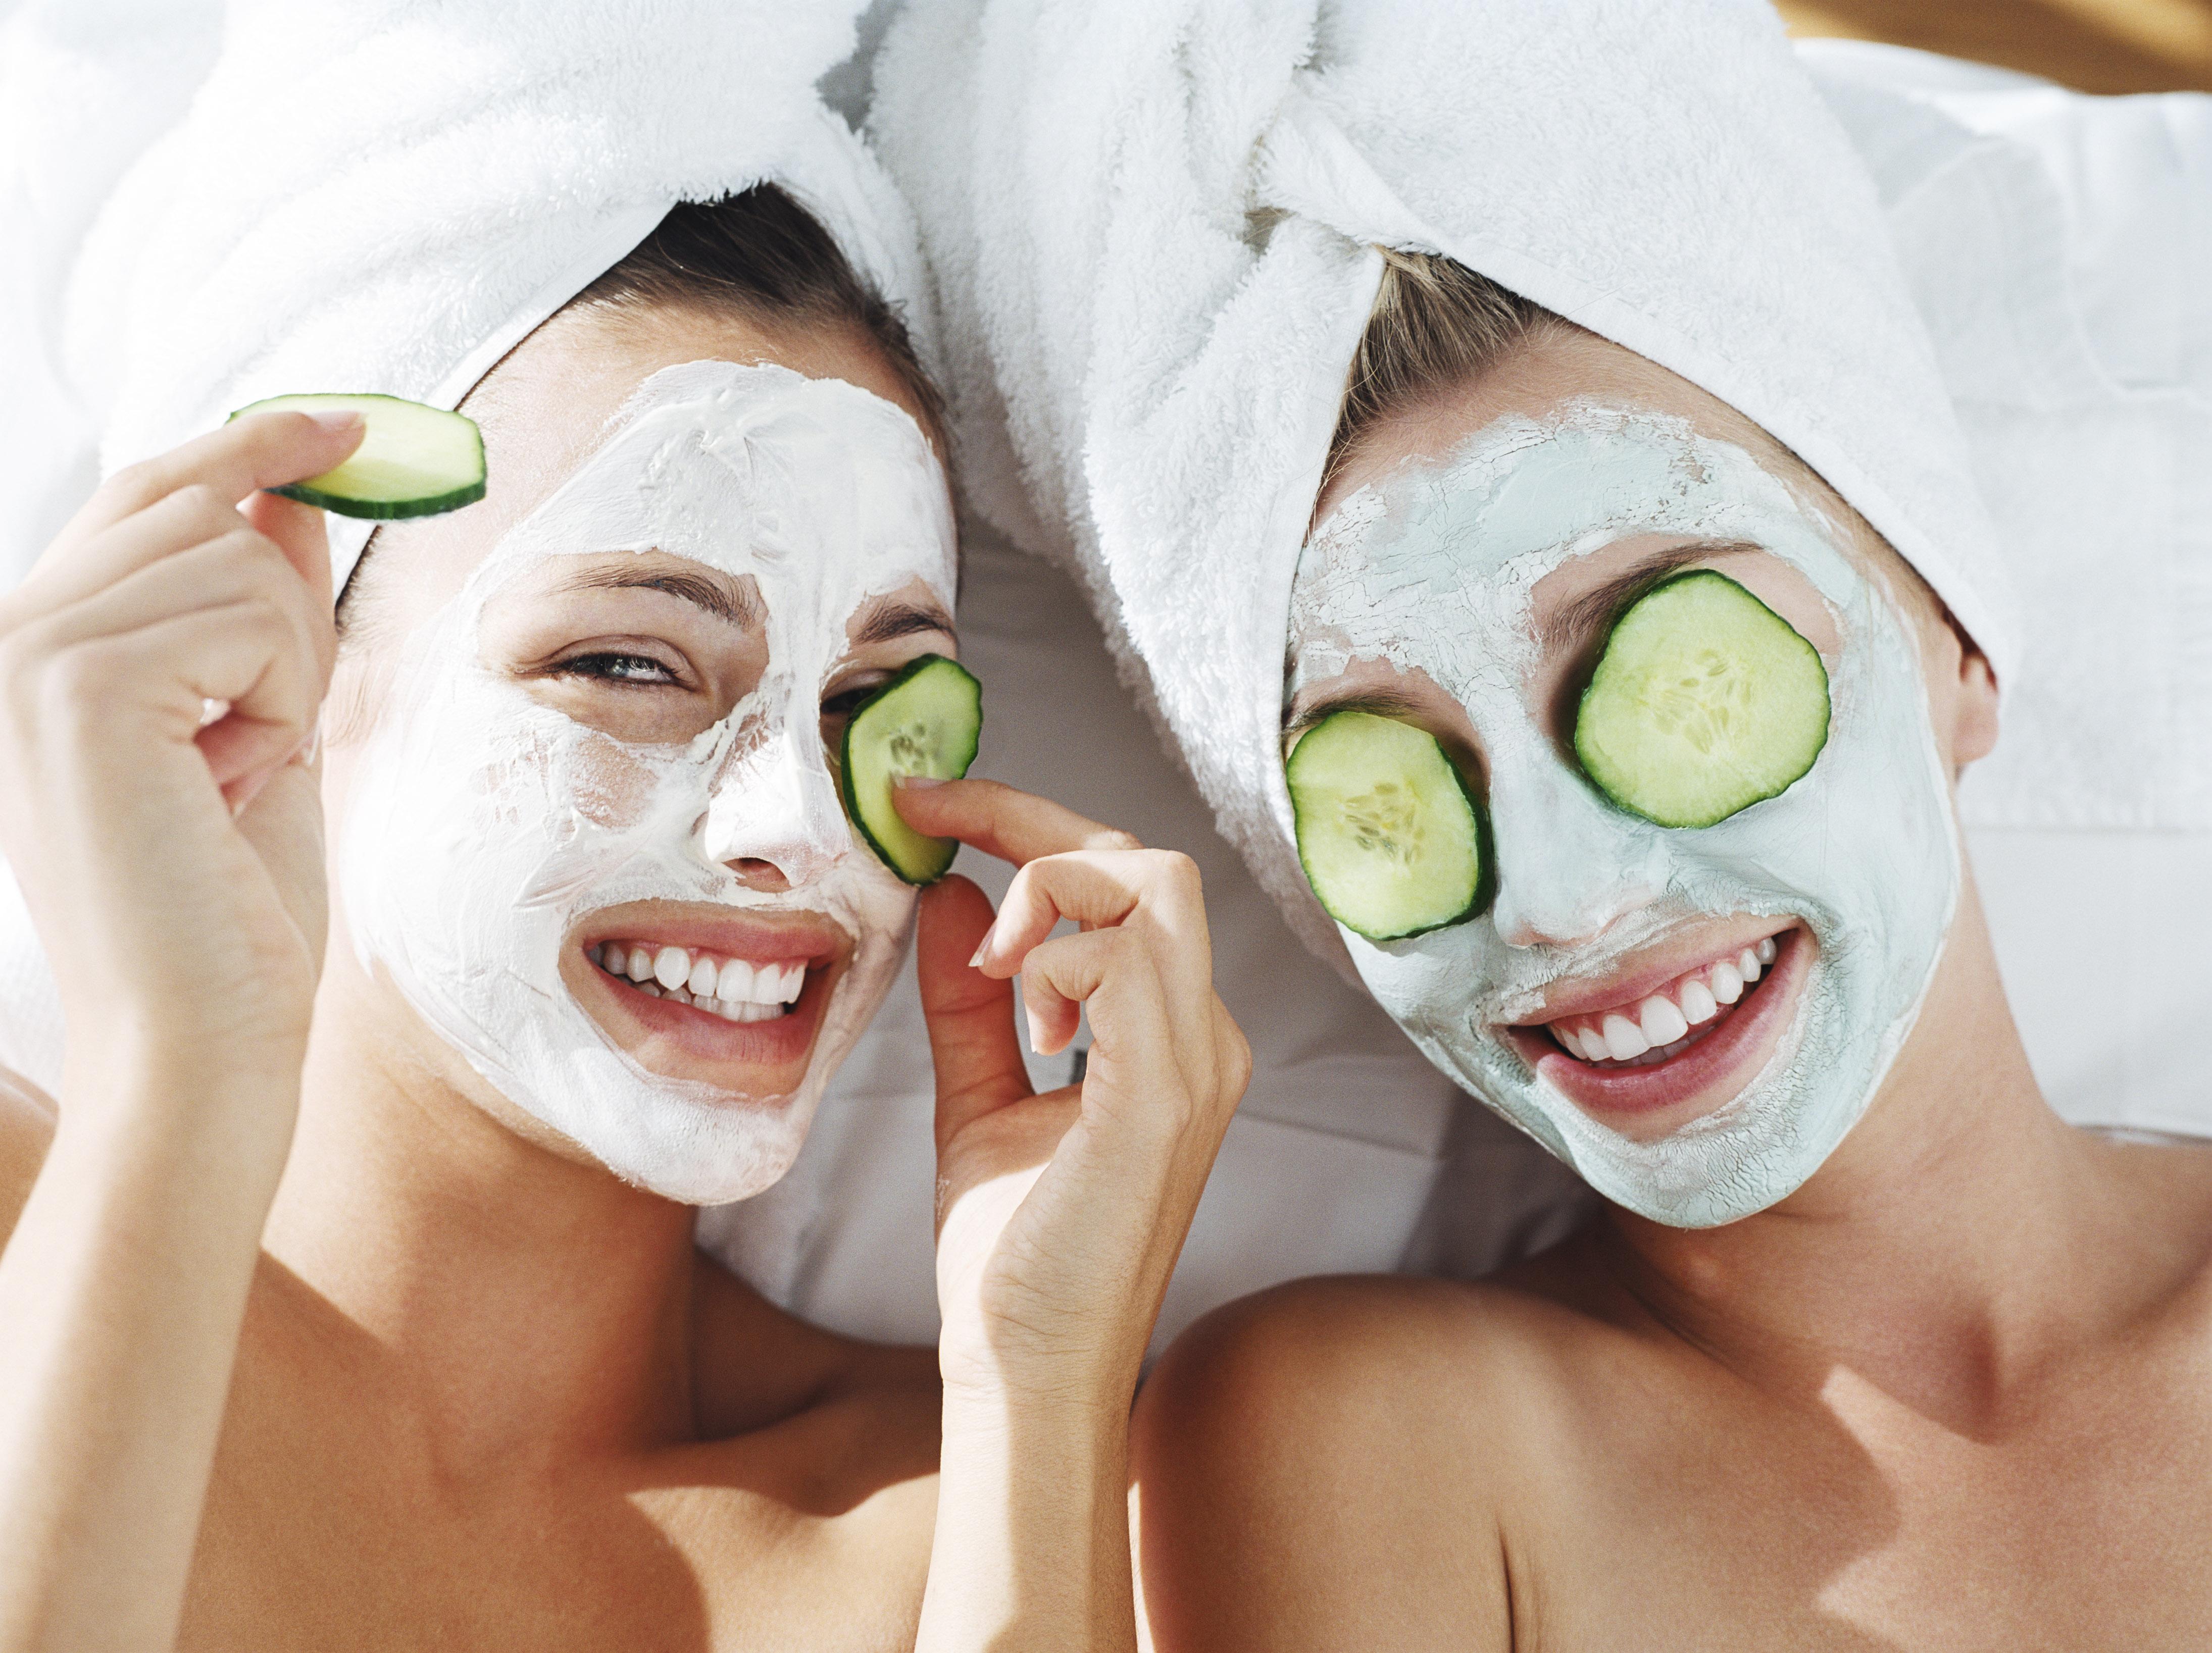 3 diy face masks that actually work fruk magazine 3 diy face masks that actually work solutioingenieria Images